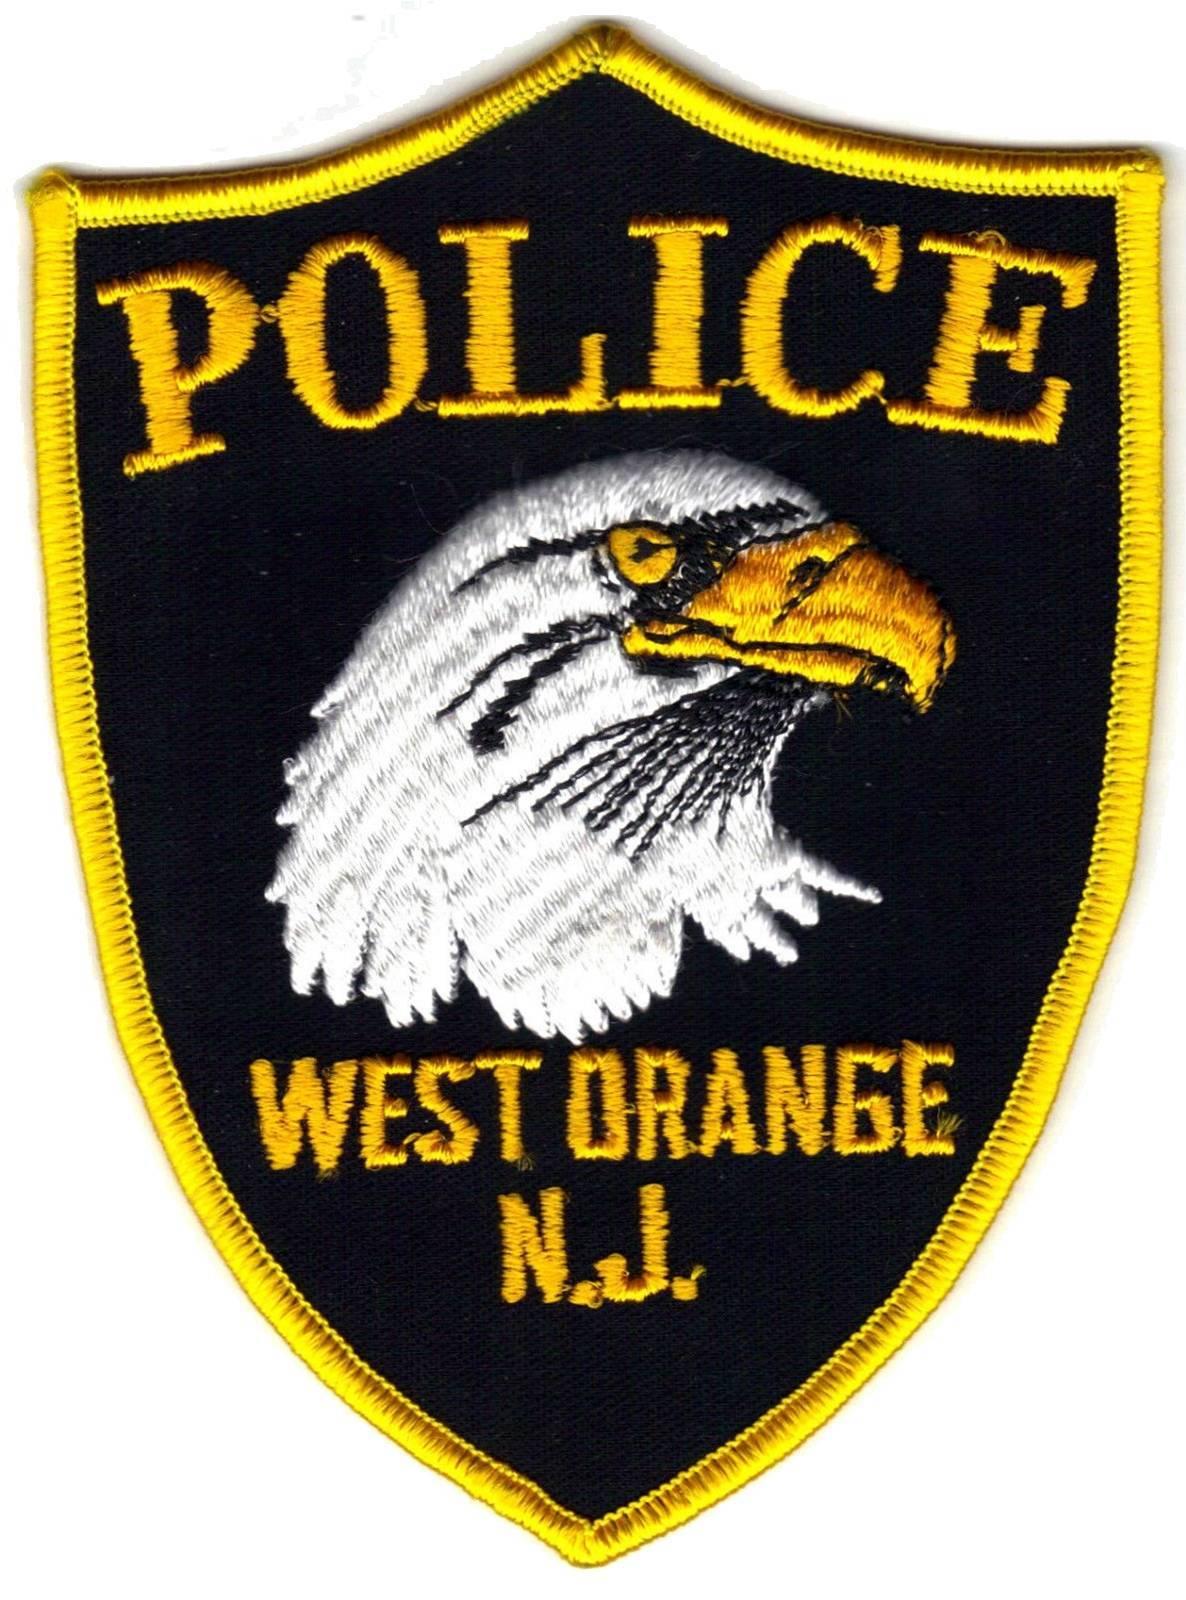 00249ed519b2420f91b1_best_1e2d0272938706939989_West_Orange_Police_Patch.jpg